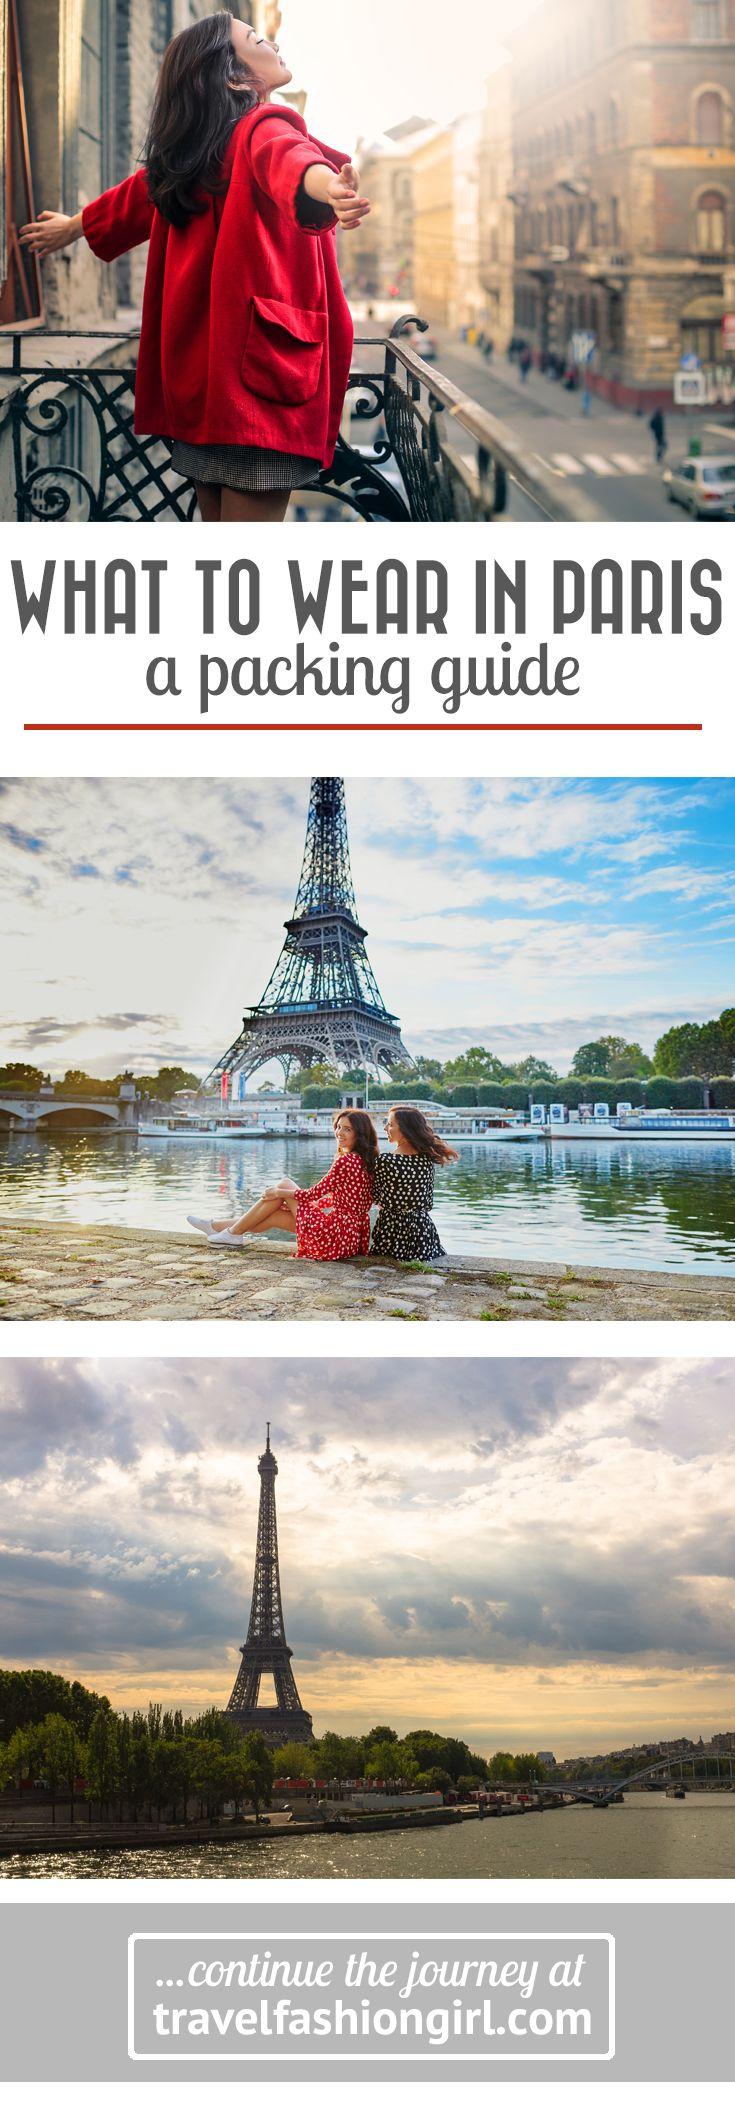 What to Wear in Paris Packing List (2020 Update) Paris